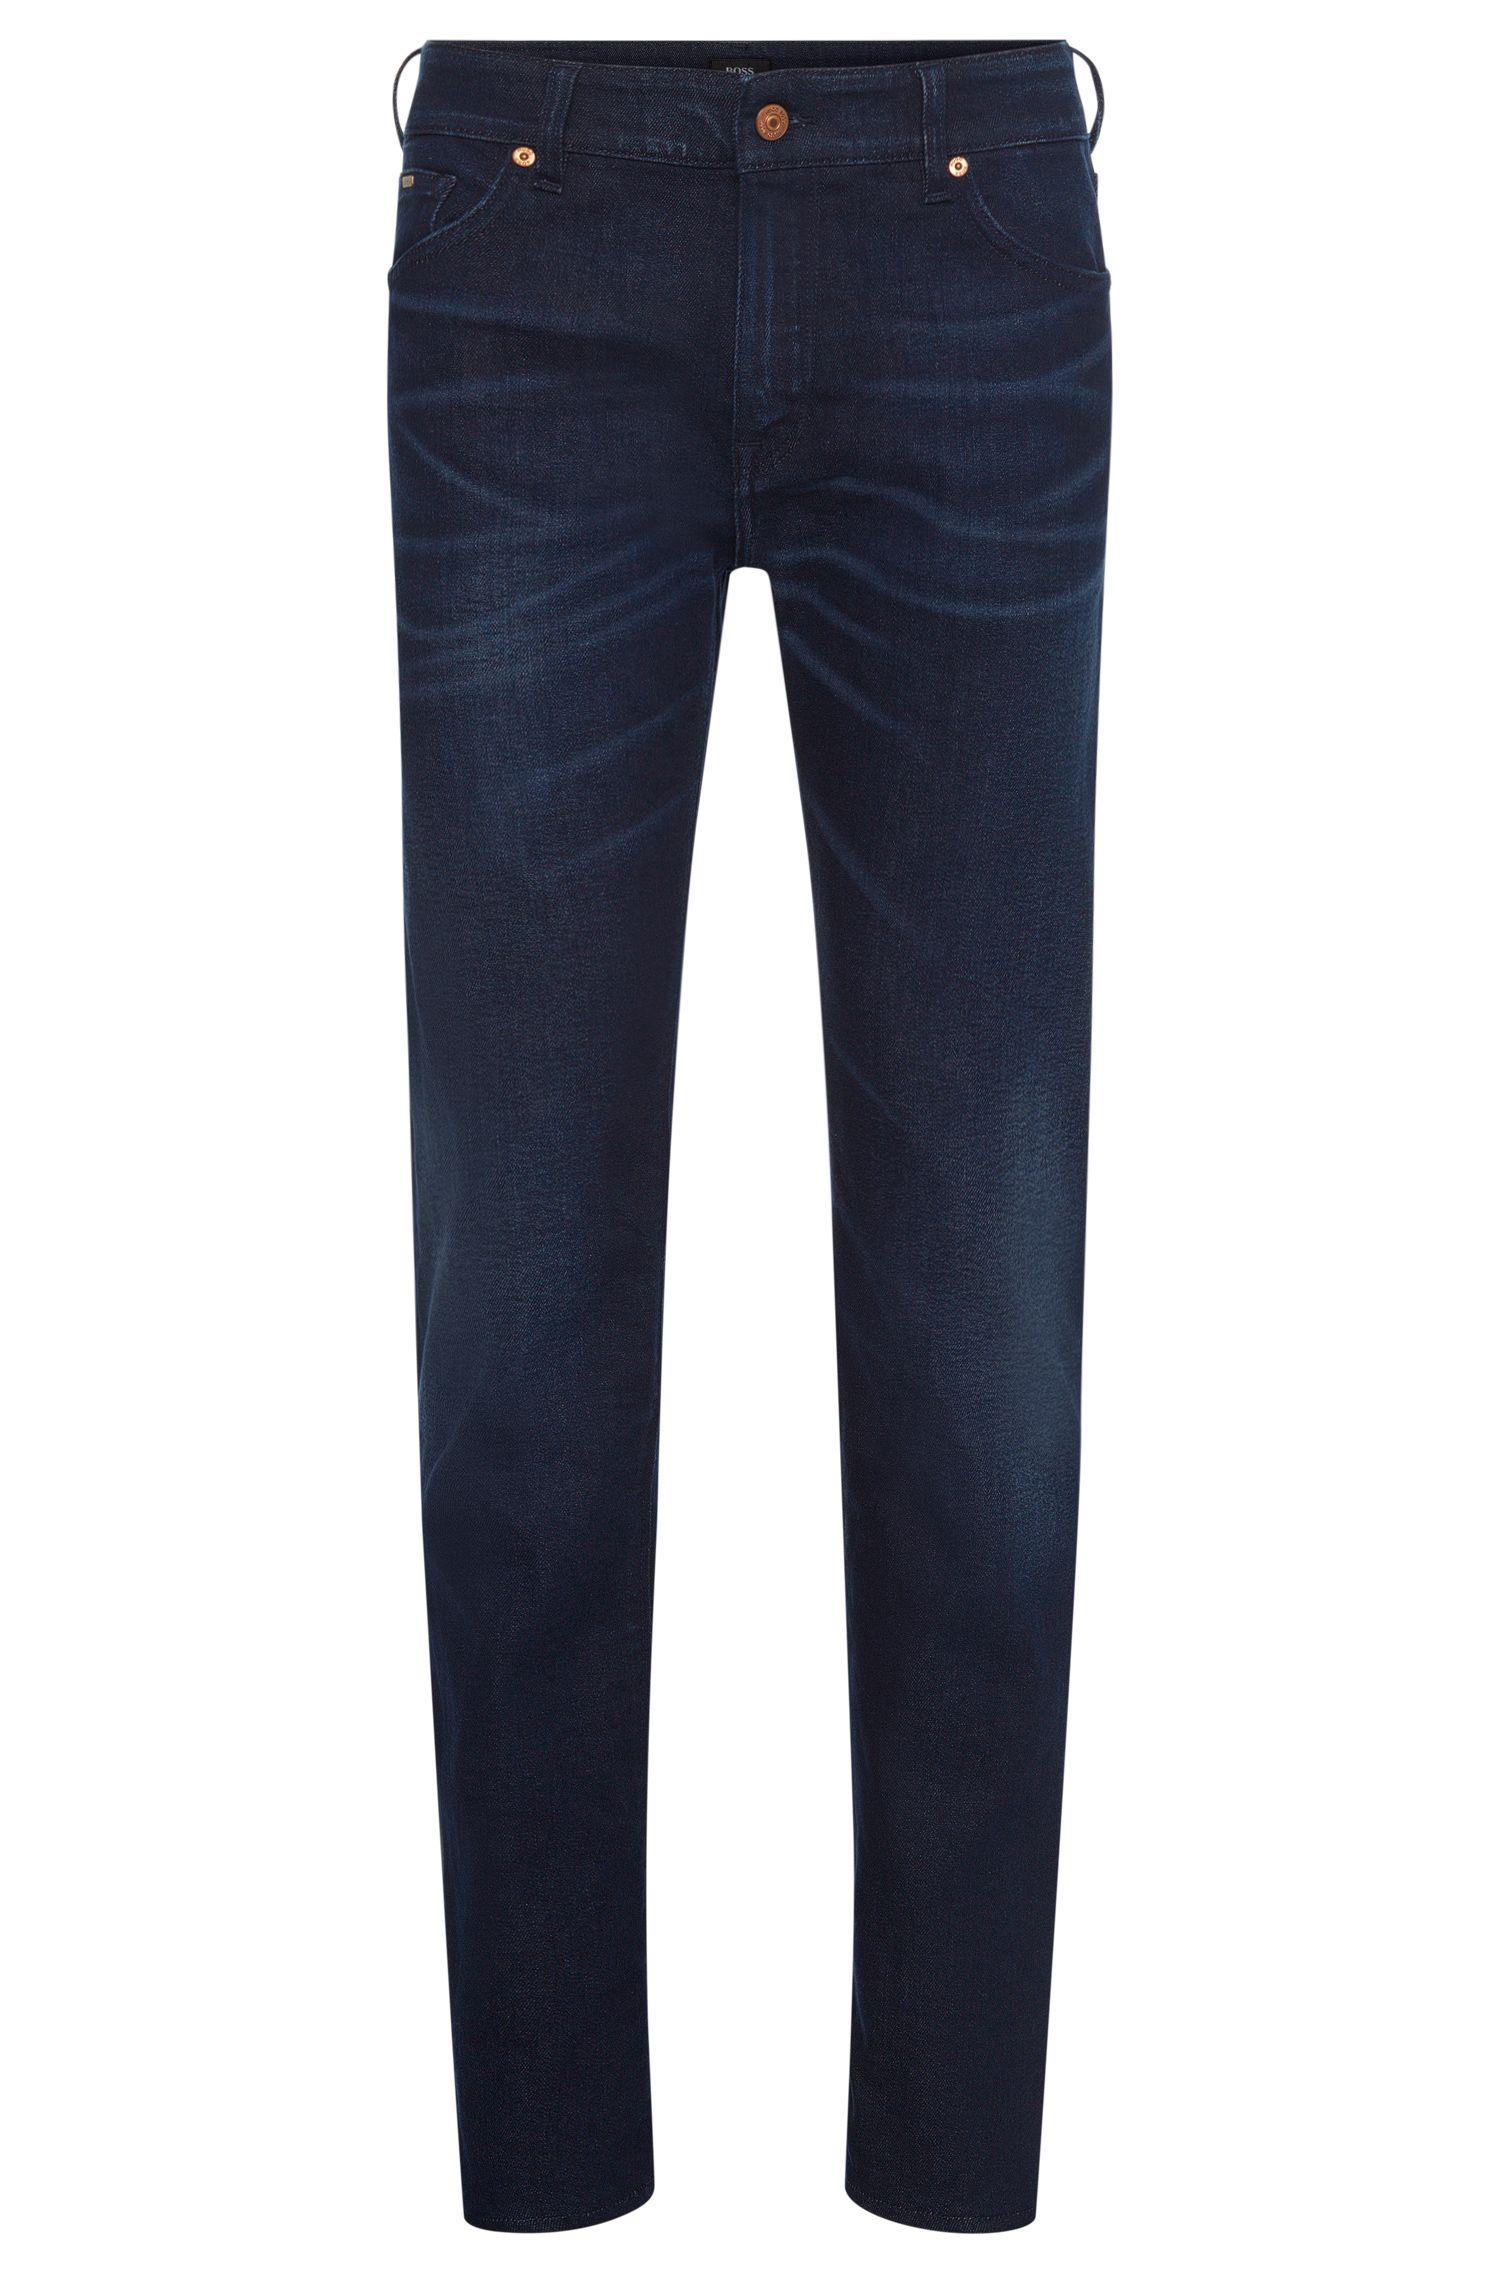 'Maine'   Regular Fit, 11.5 oz Stretch Cotton Blend Jeans